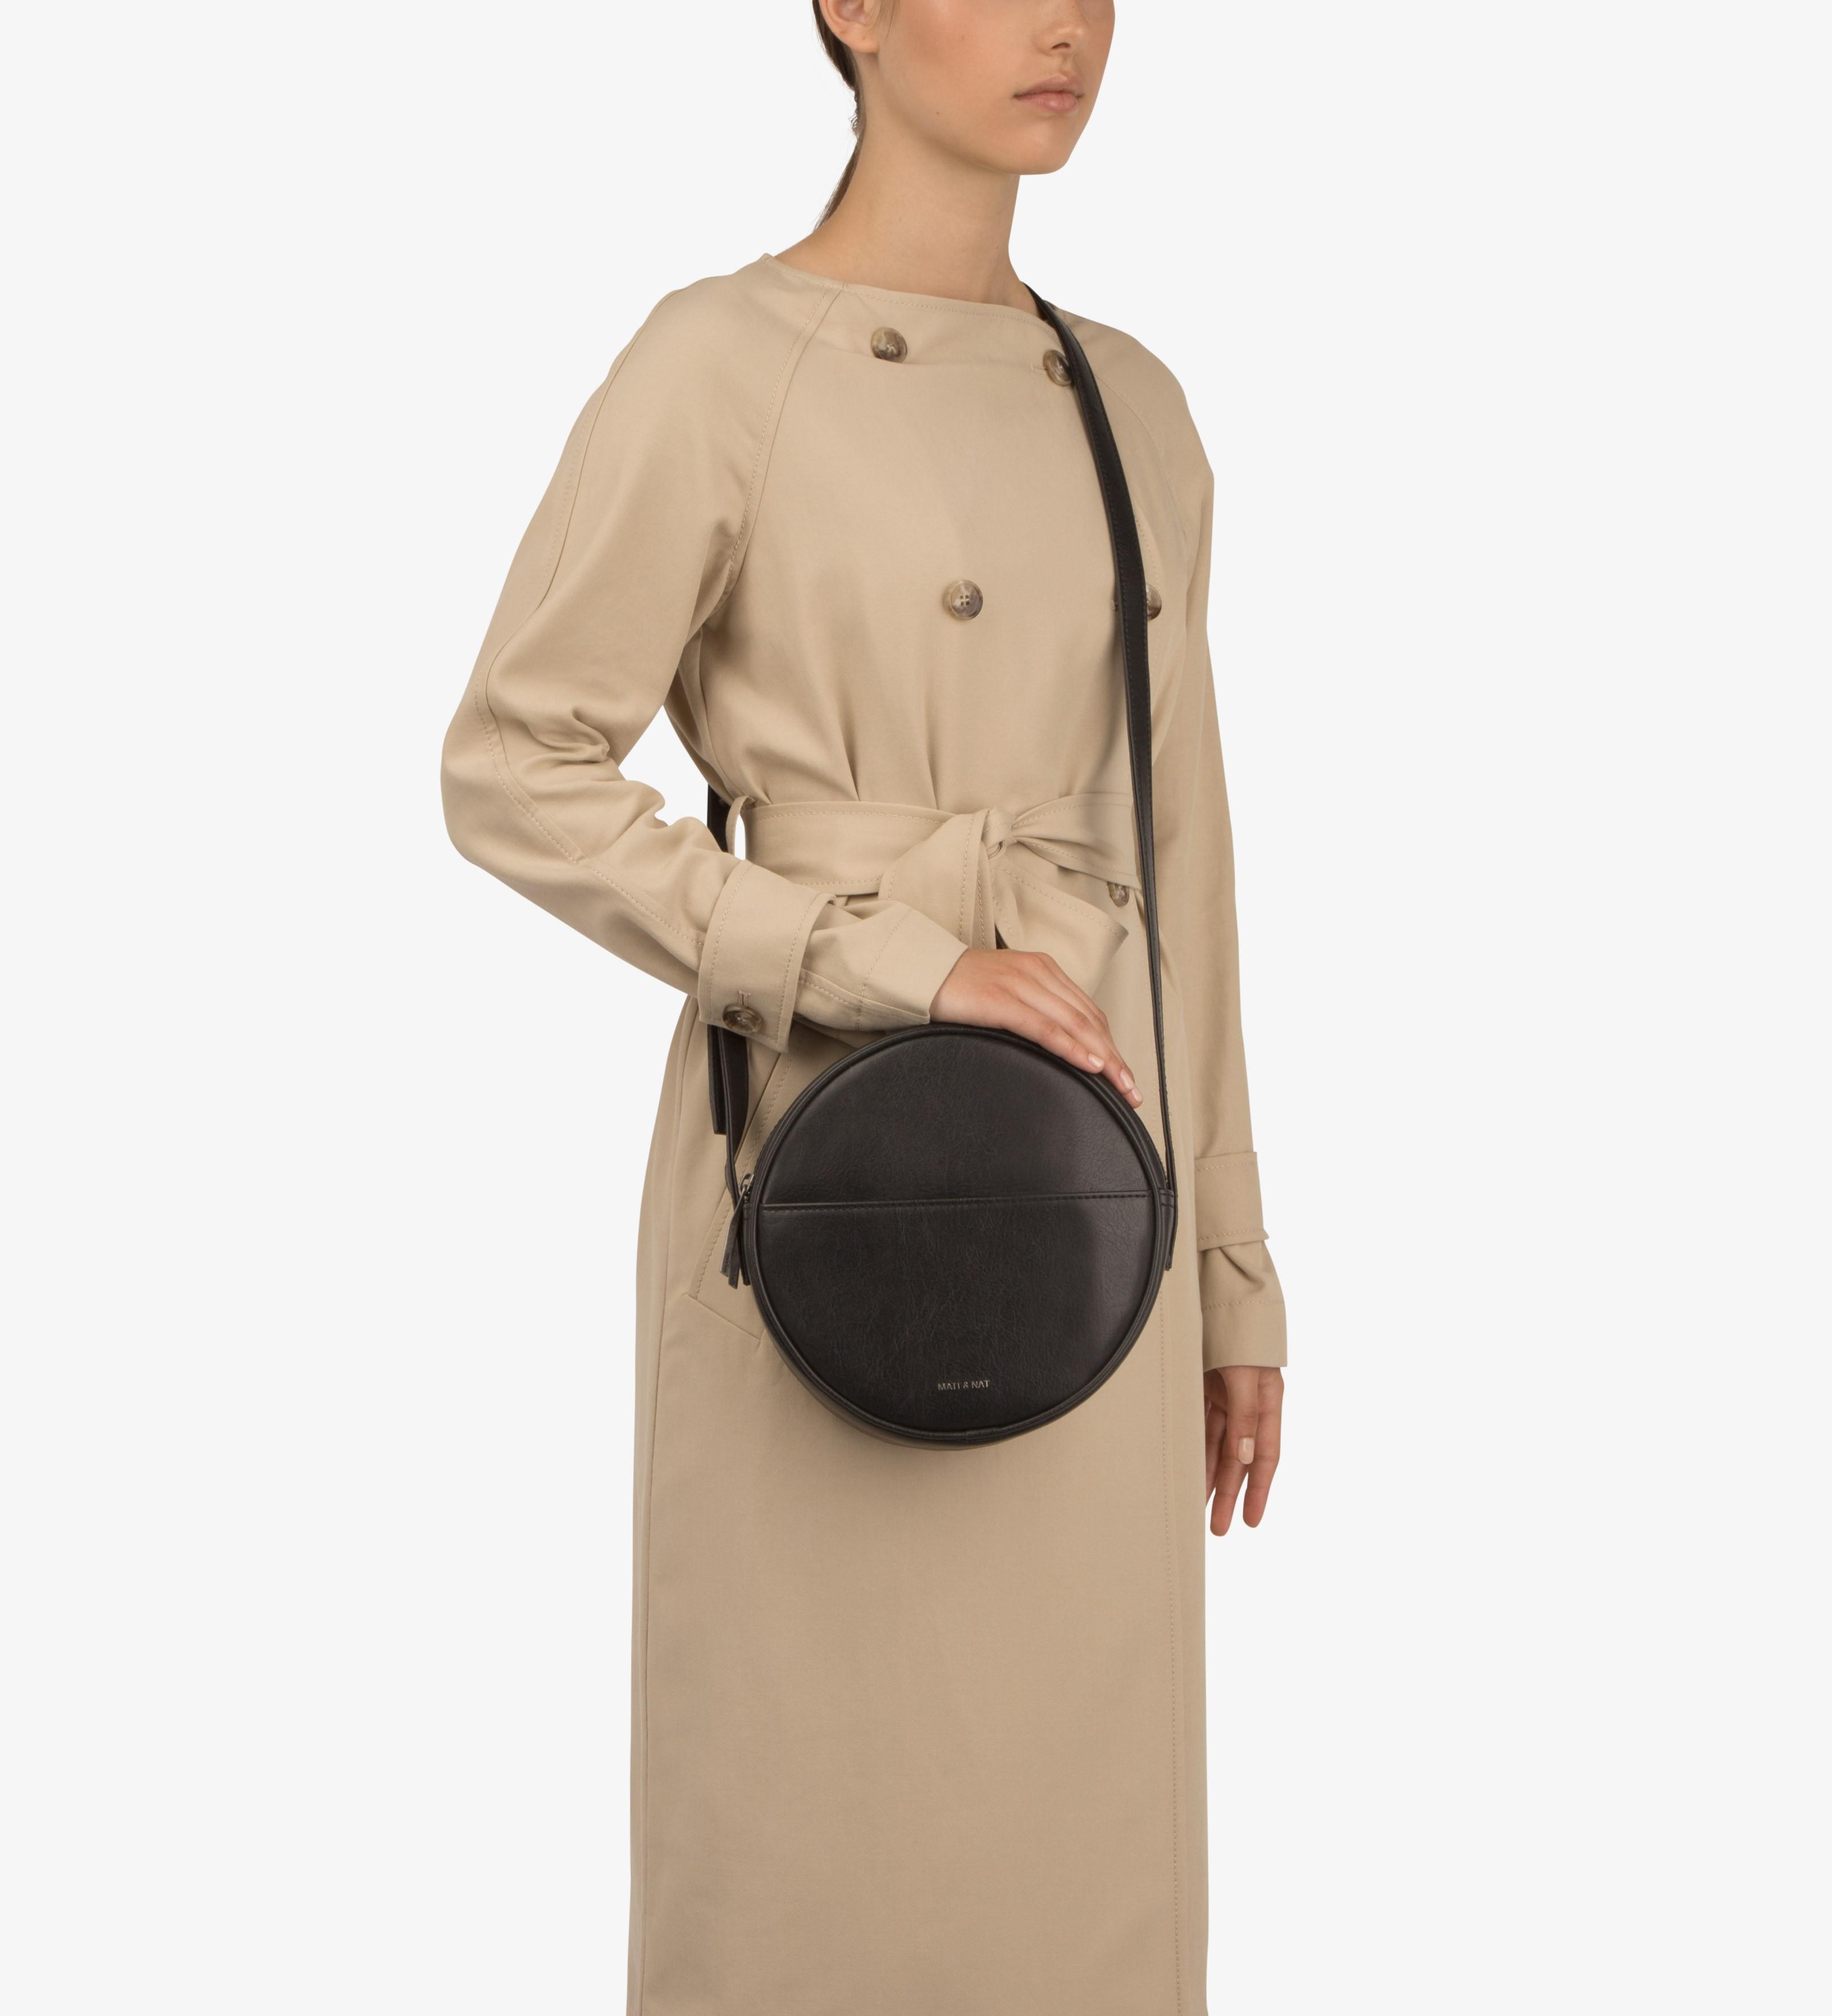 sac à main circulaire, matt and nat